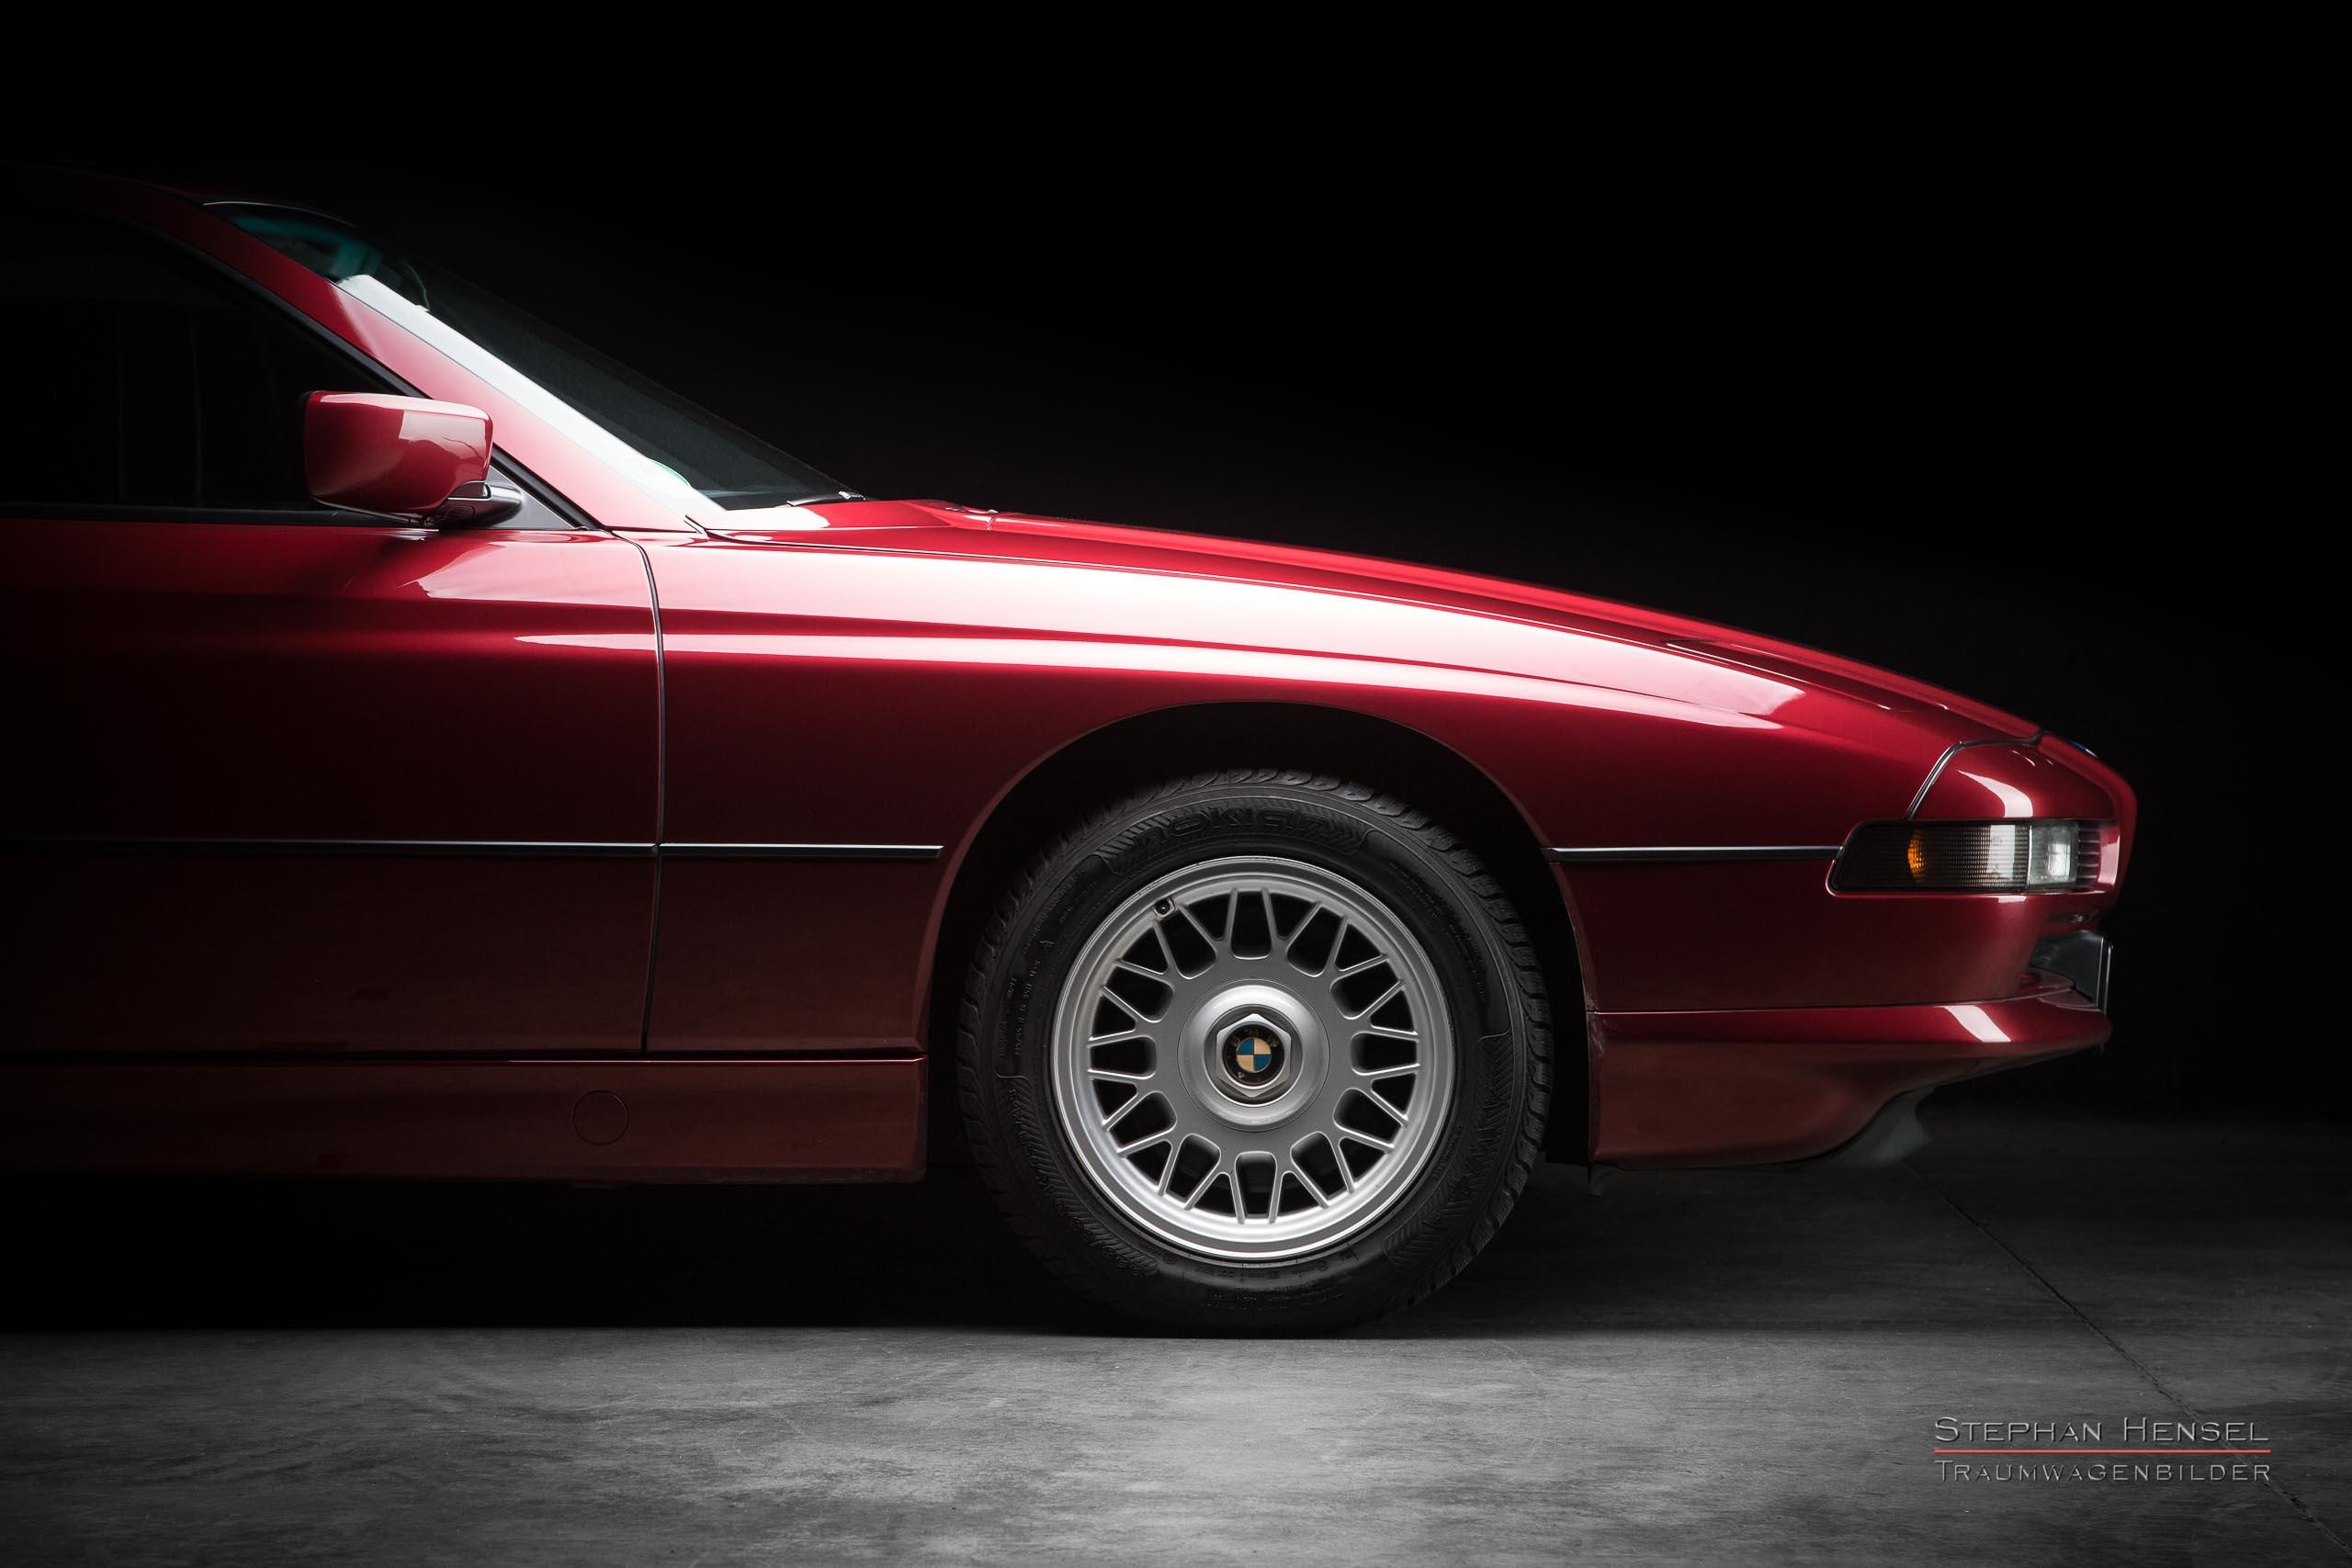 BMW 850i, 1991, Seitenansicht, Autofotograf, Hamburg, Automobilfotograf, Oldtimerfotograf, Oldtimerfotografie, Car Photography, Stephan Hensel